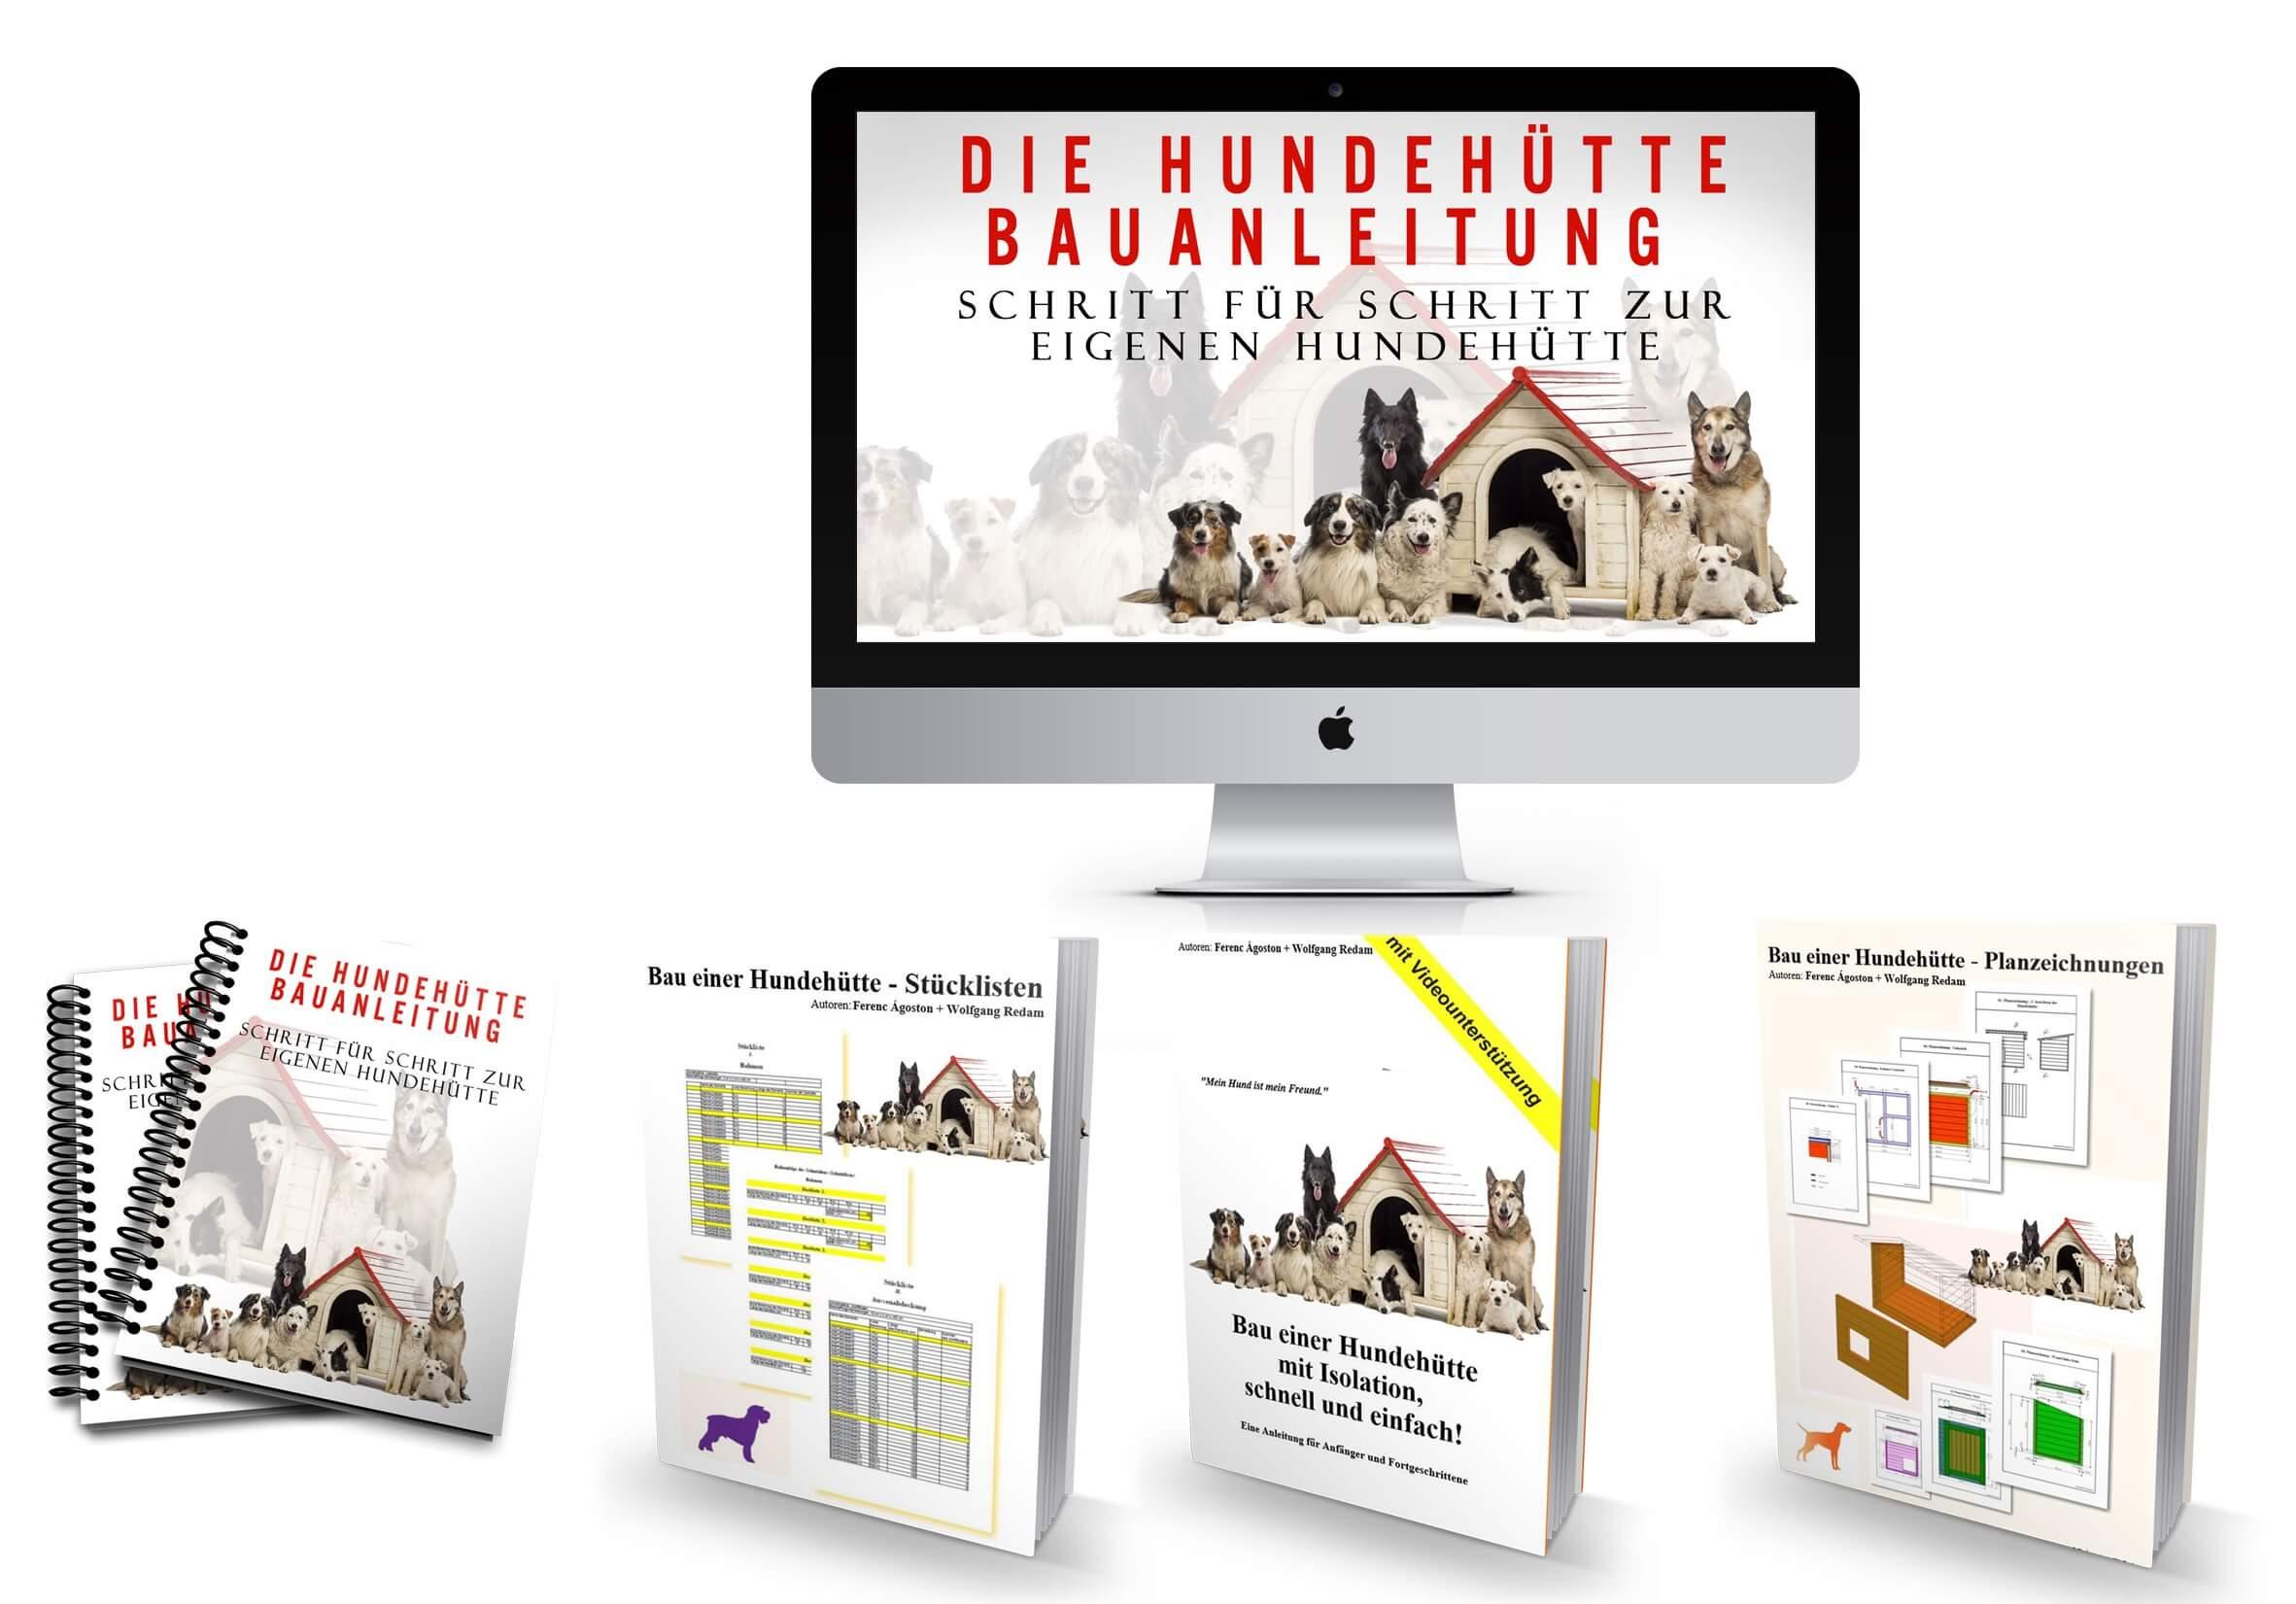 I I Hundehutte Bauanleitung Online Kurs Jetzt Kaufen I Zumara